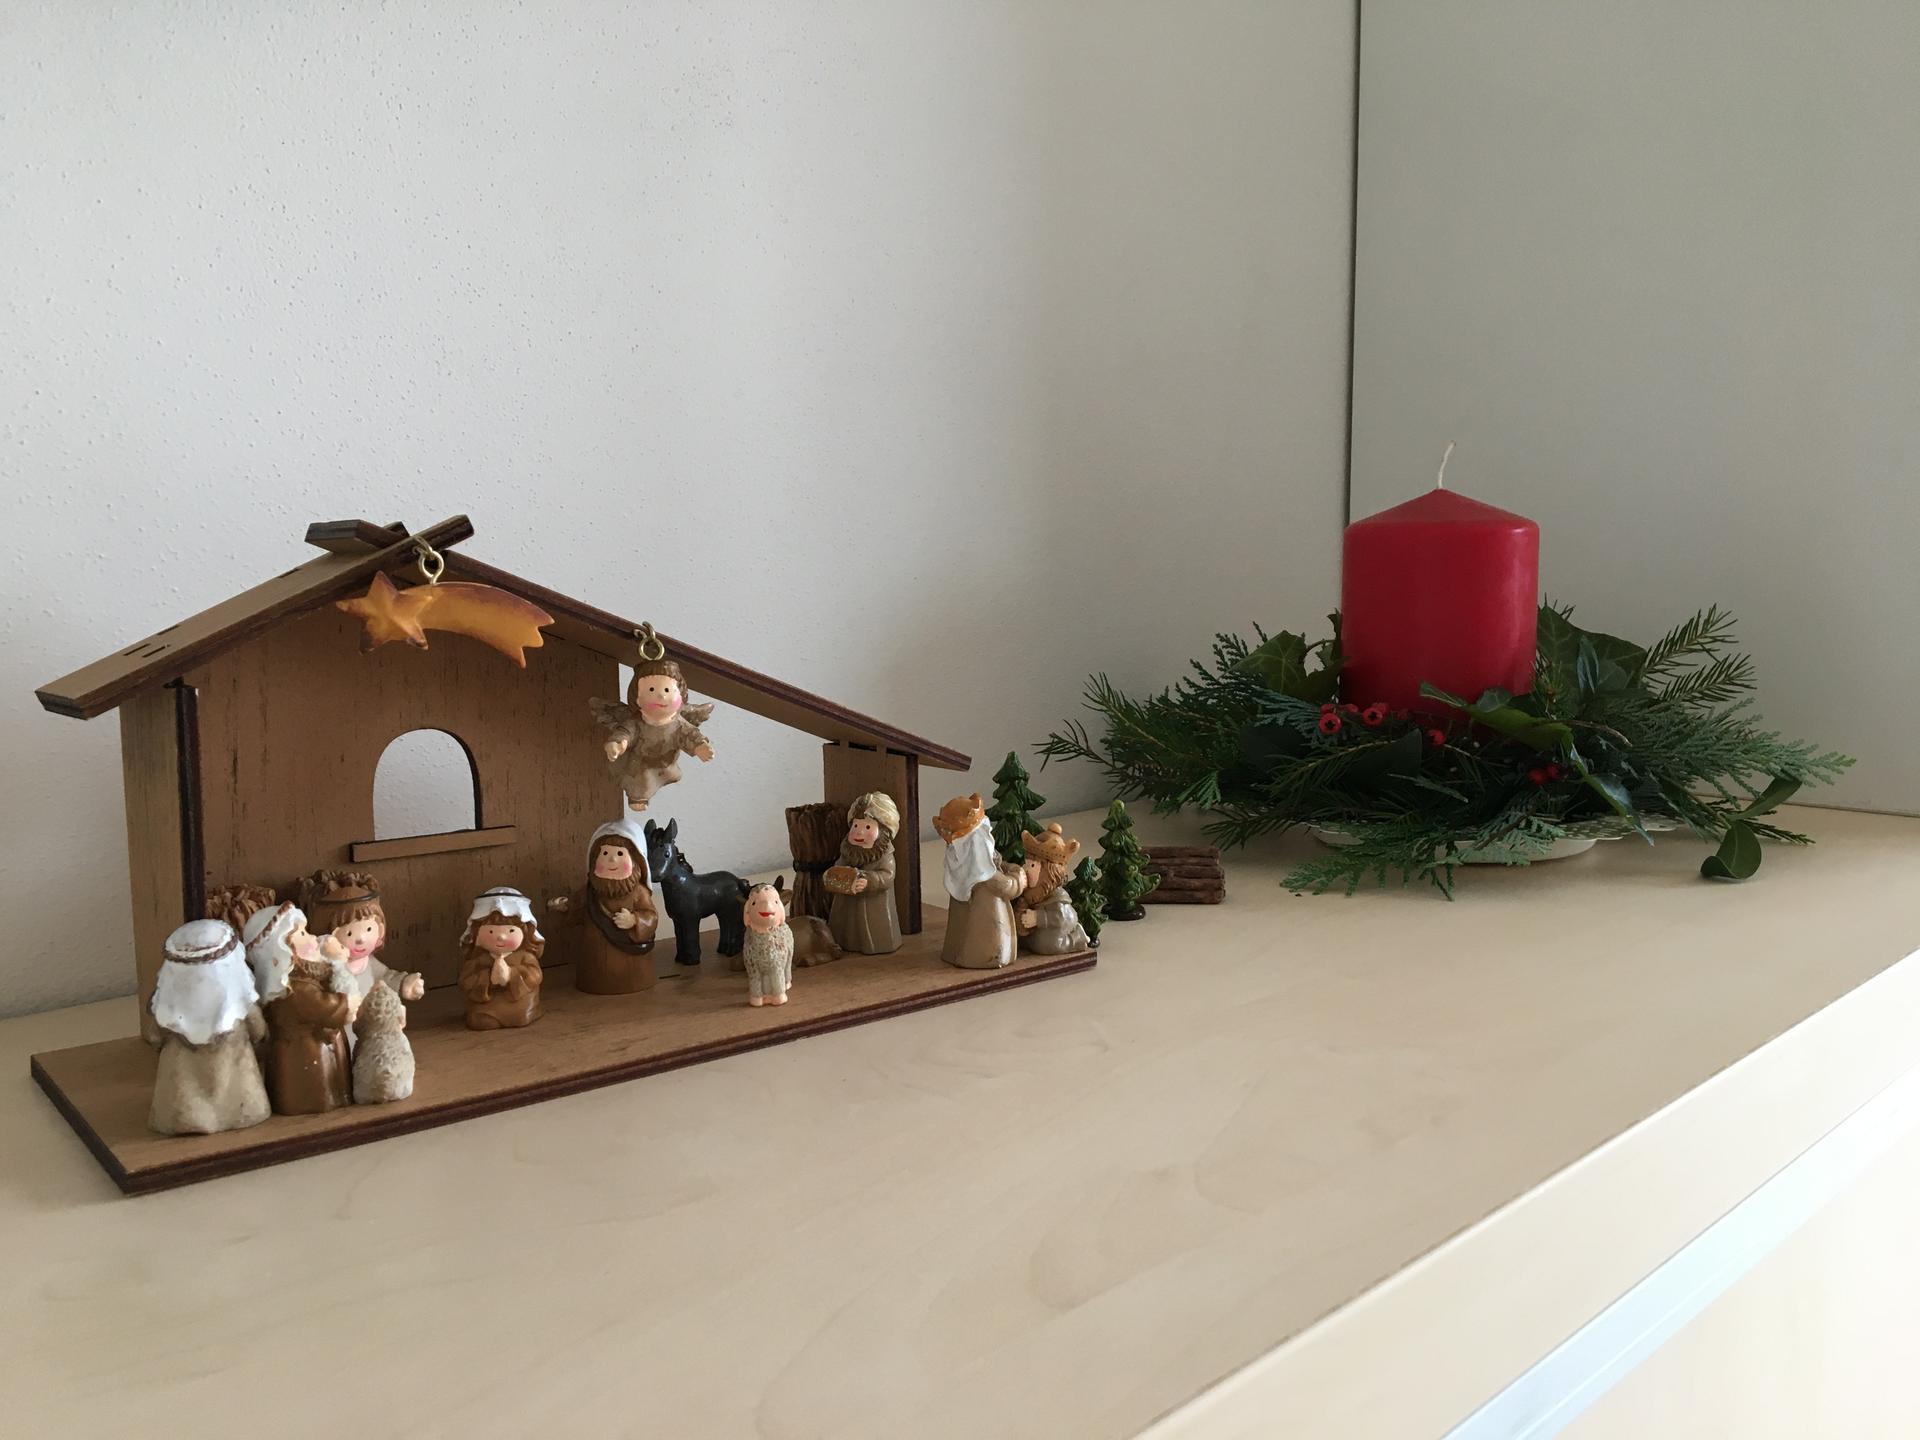 Tvorime domov - Čakame na Ježiška